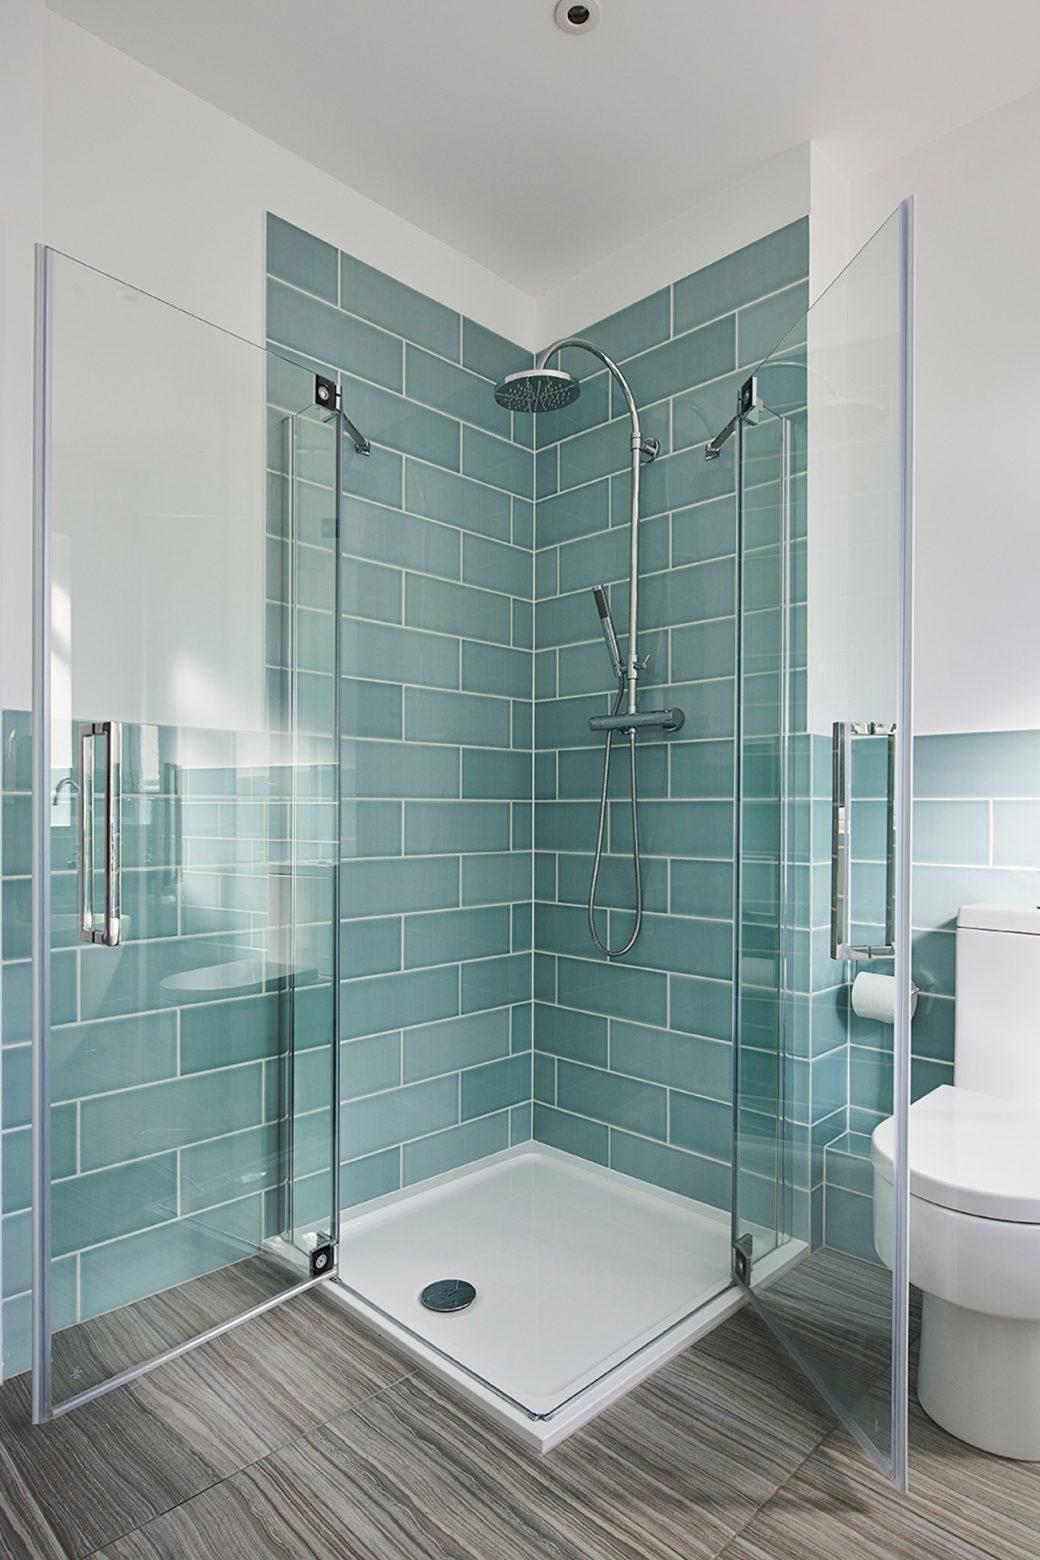 Azure blue tiles in bathroom